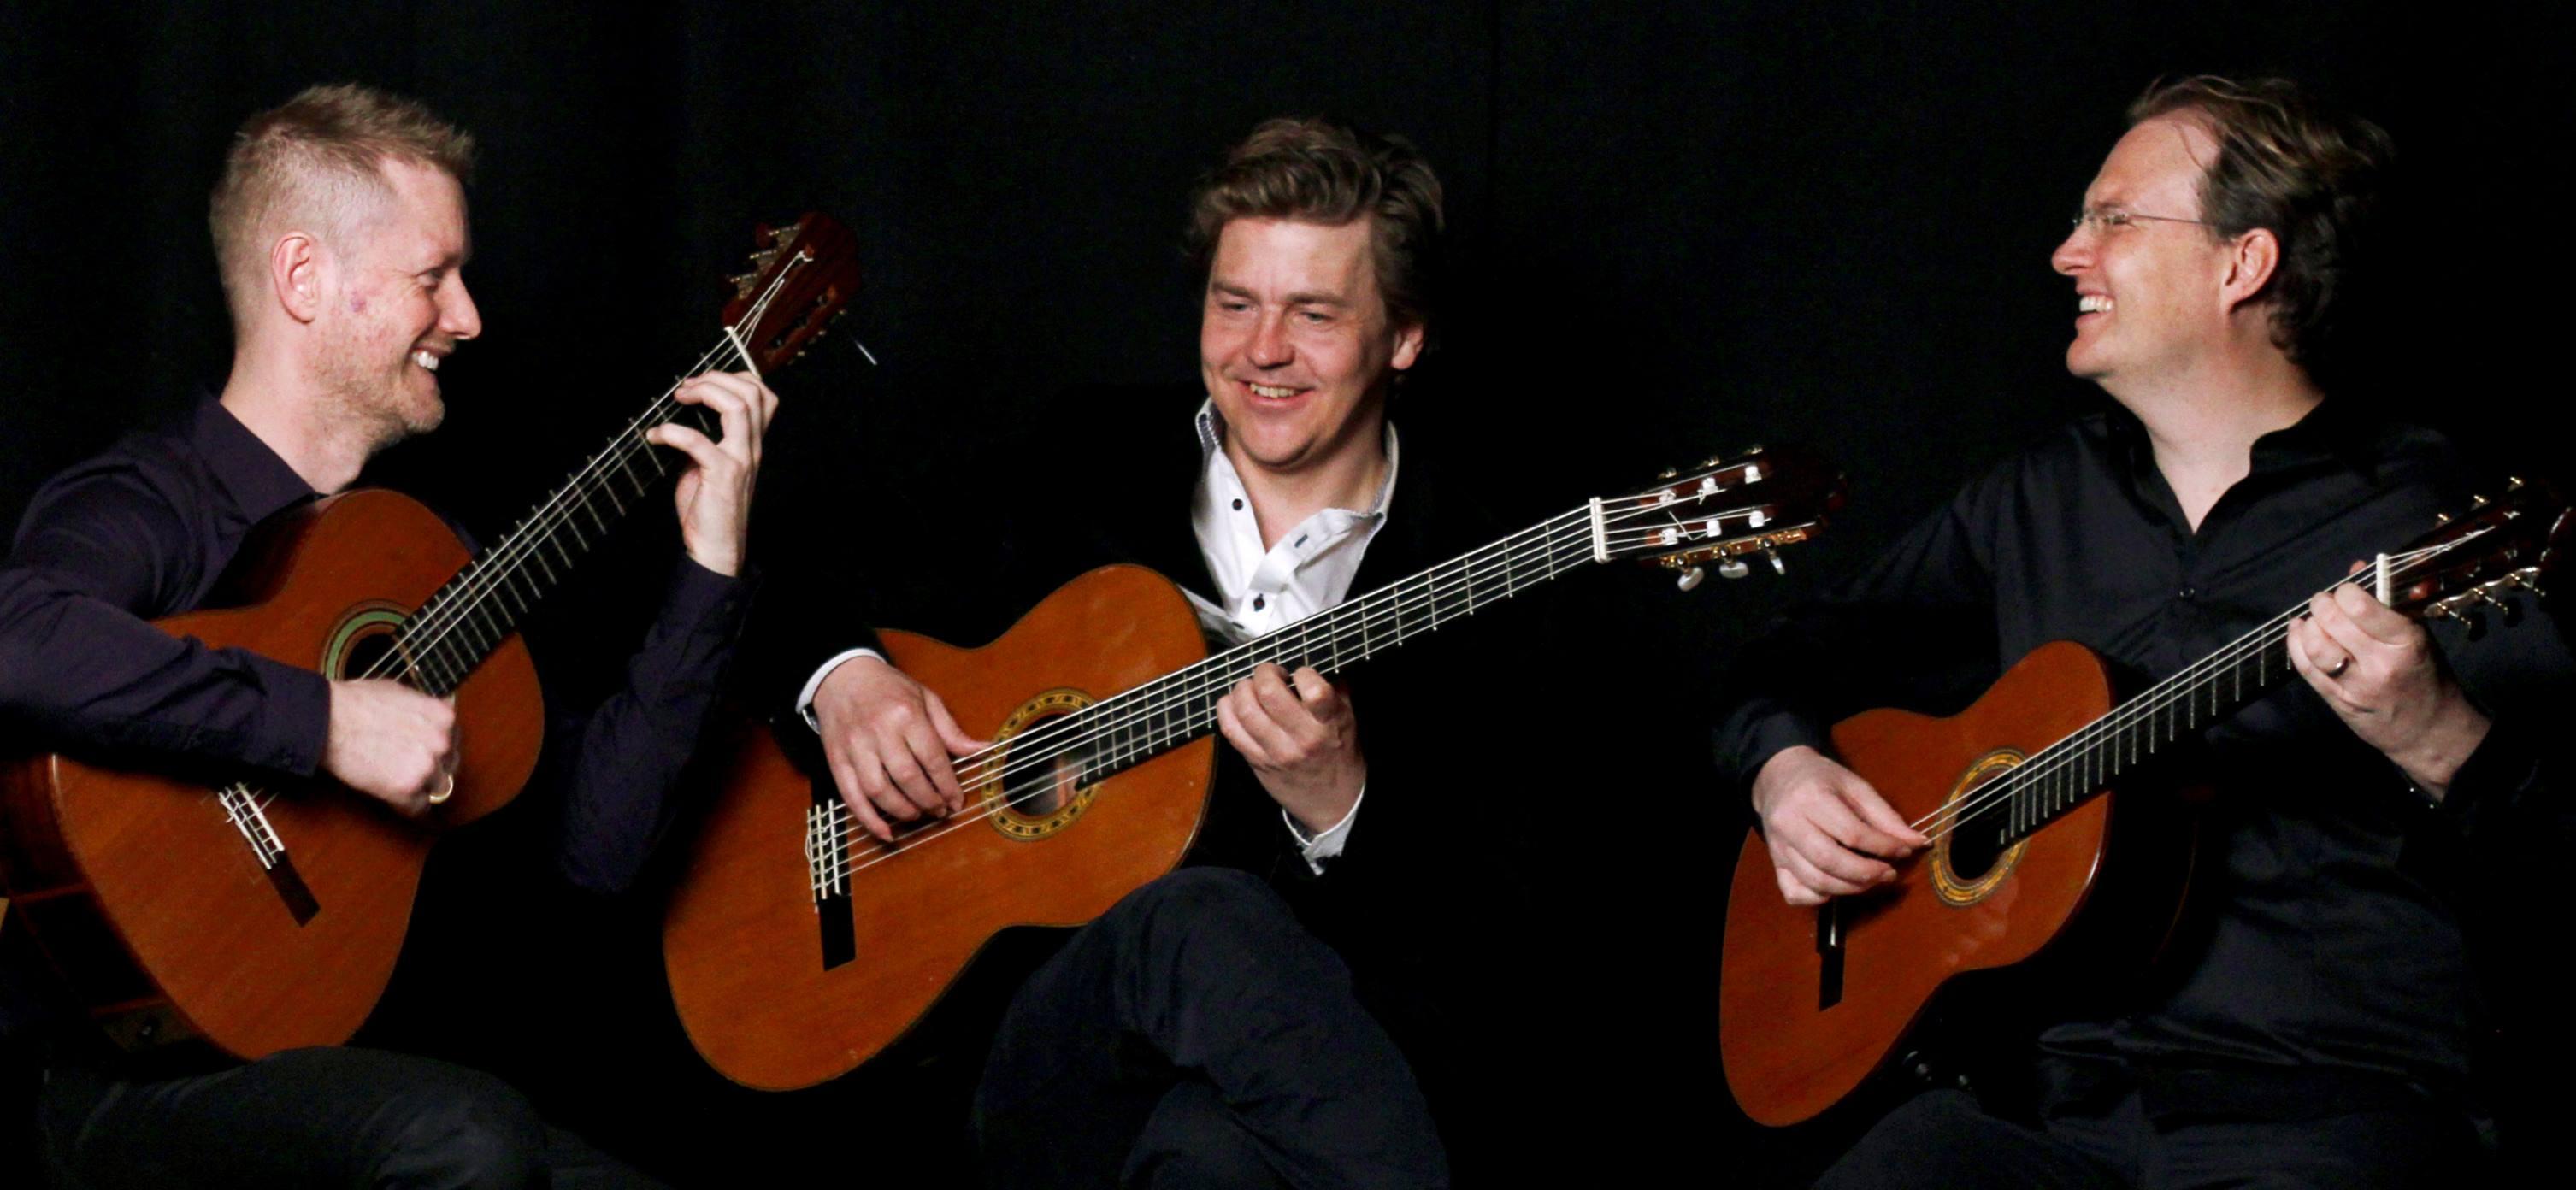 Bandmedlemmar Greger Hansson, Calle Ljungkvist, Niklas Johnson